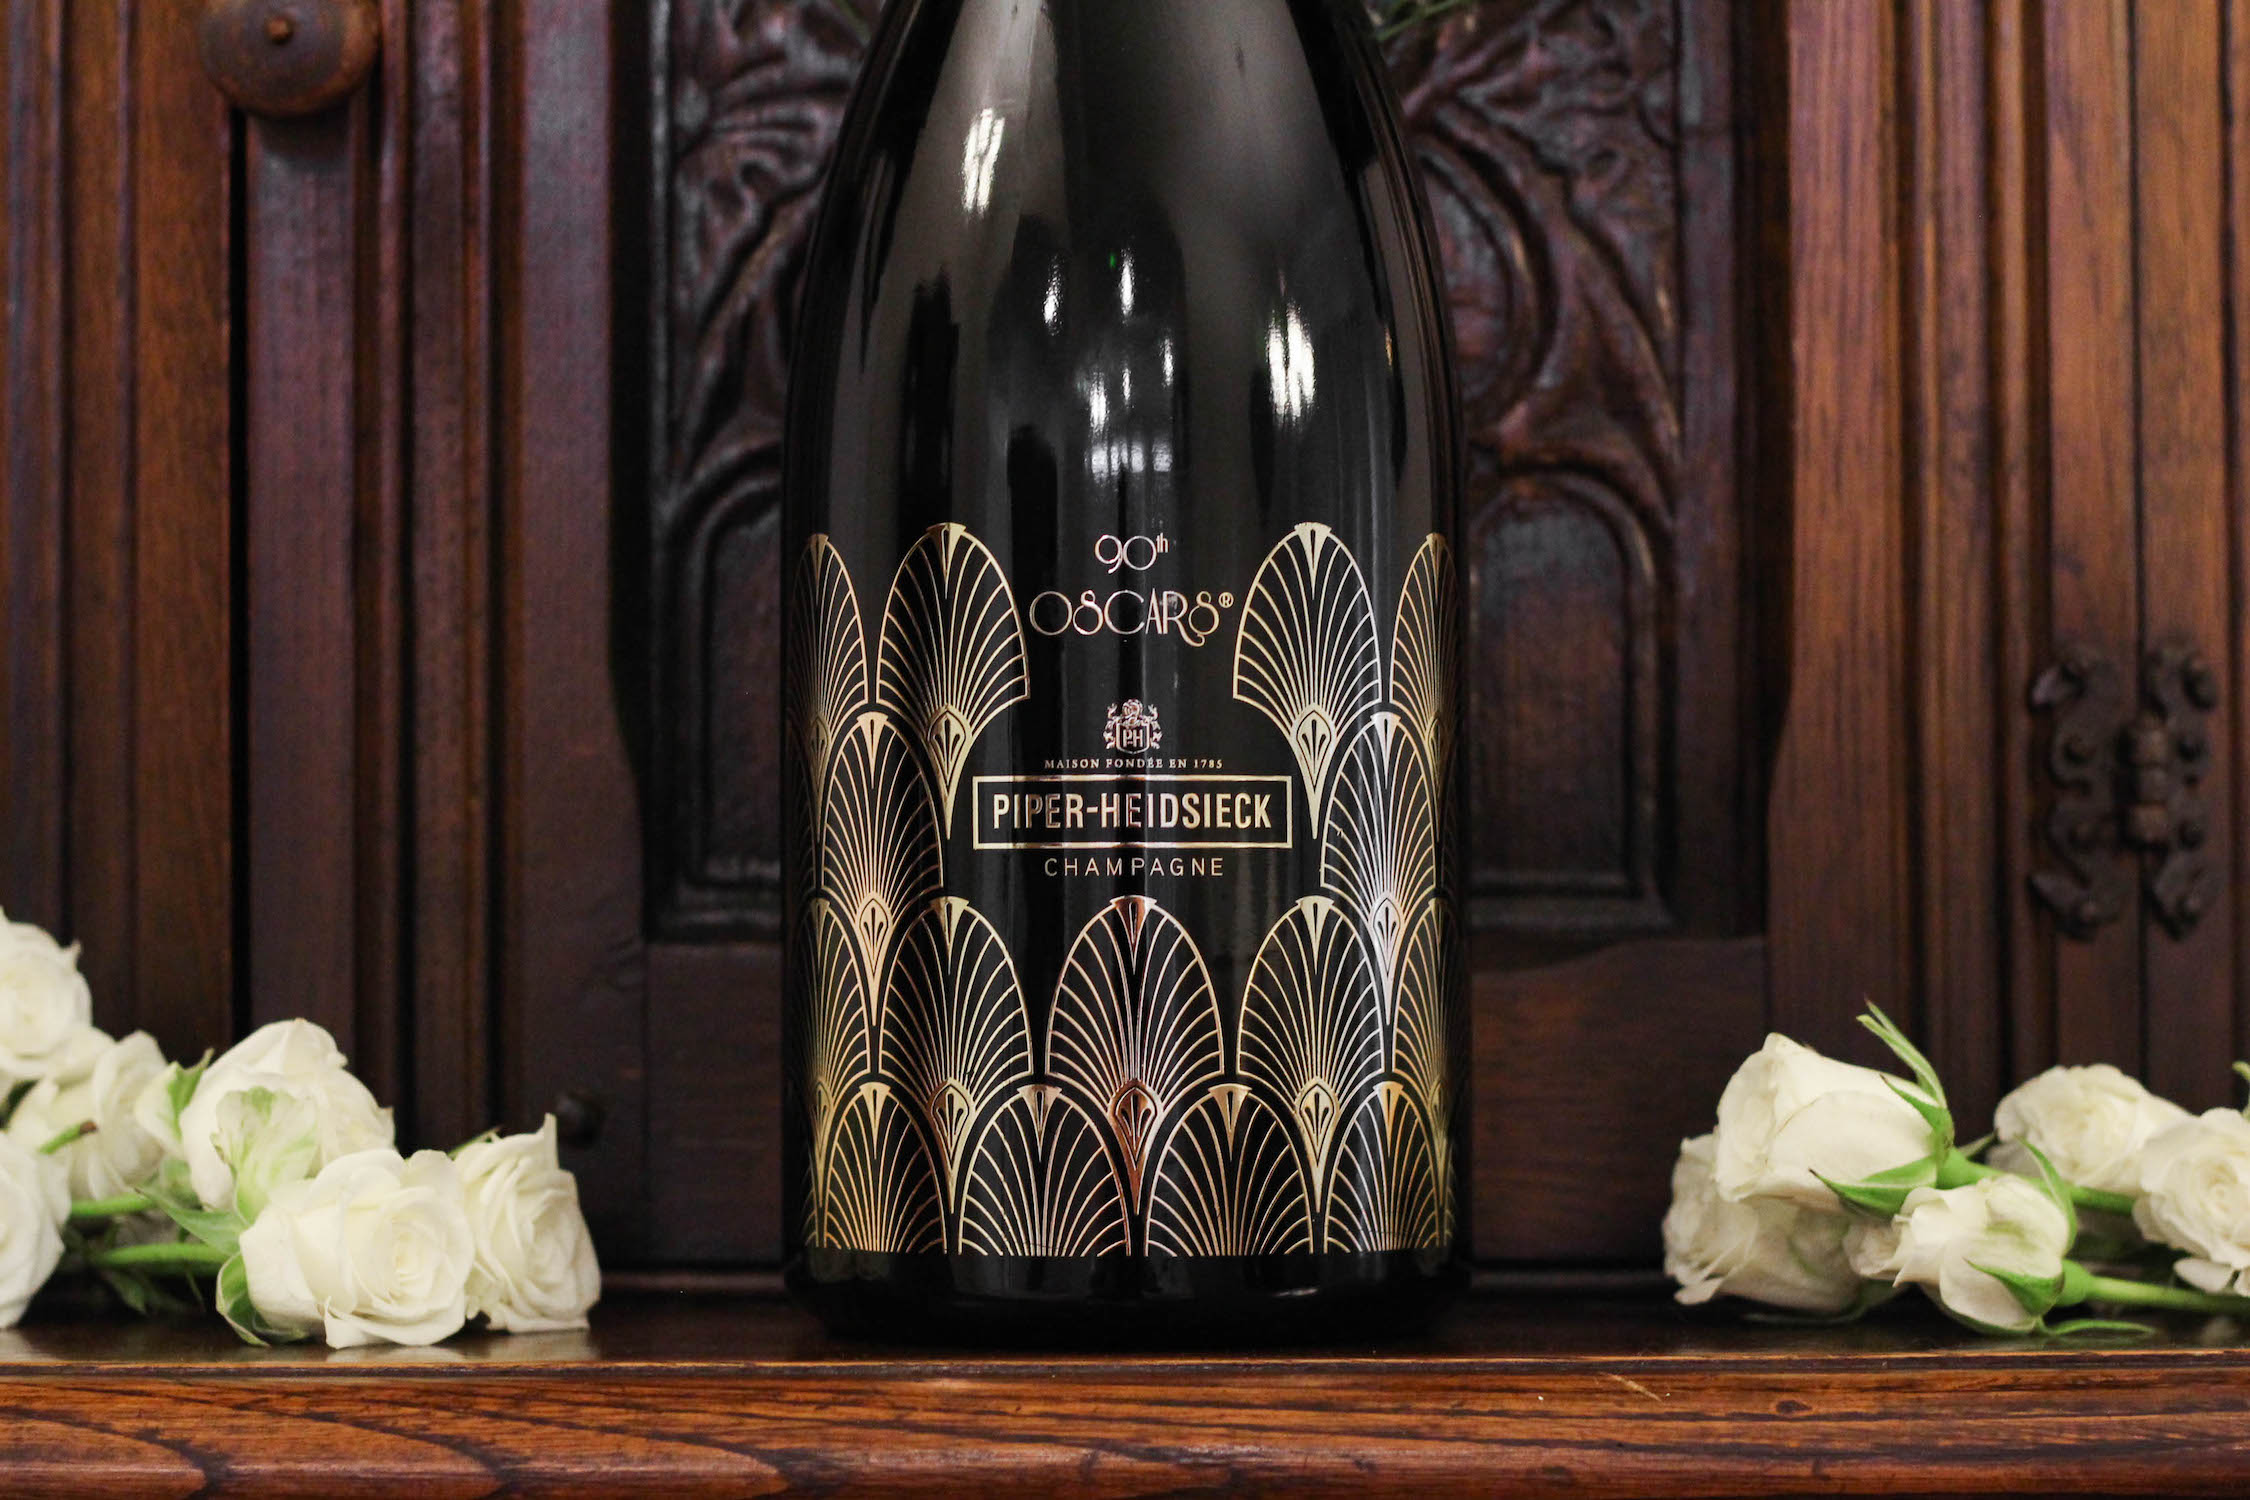 Piper Heidsieck champagne & de Oscars